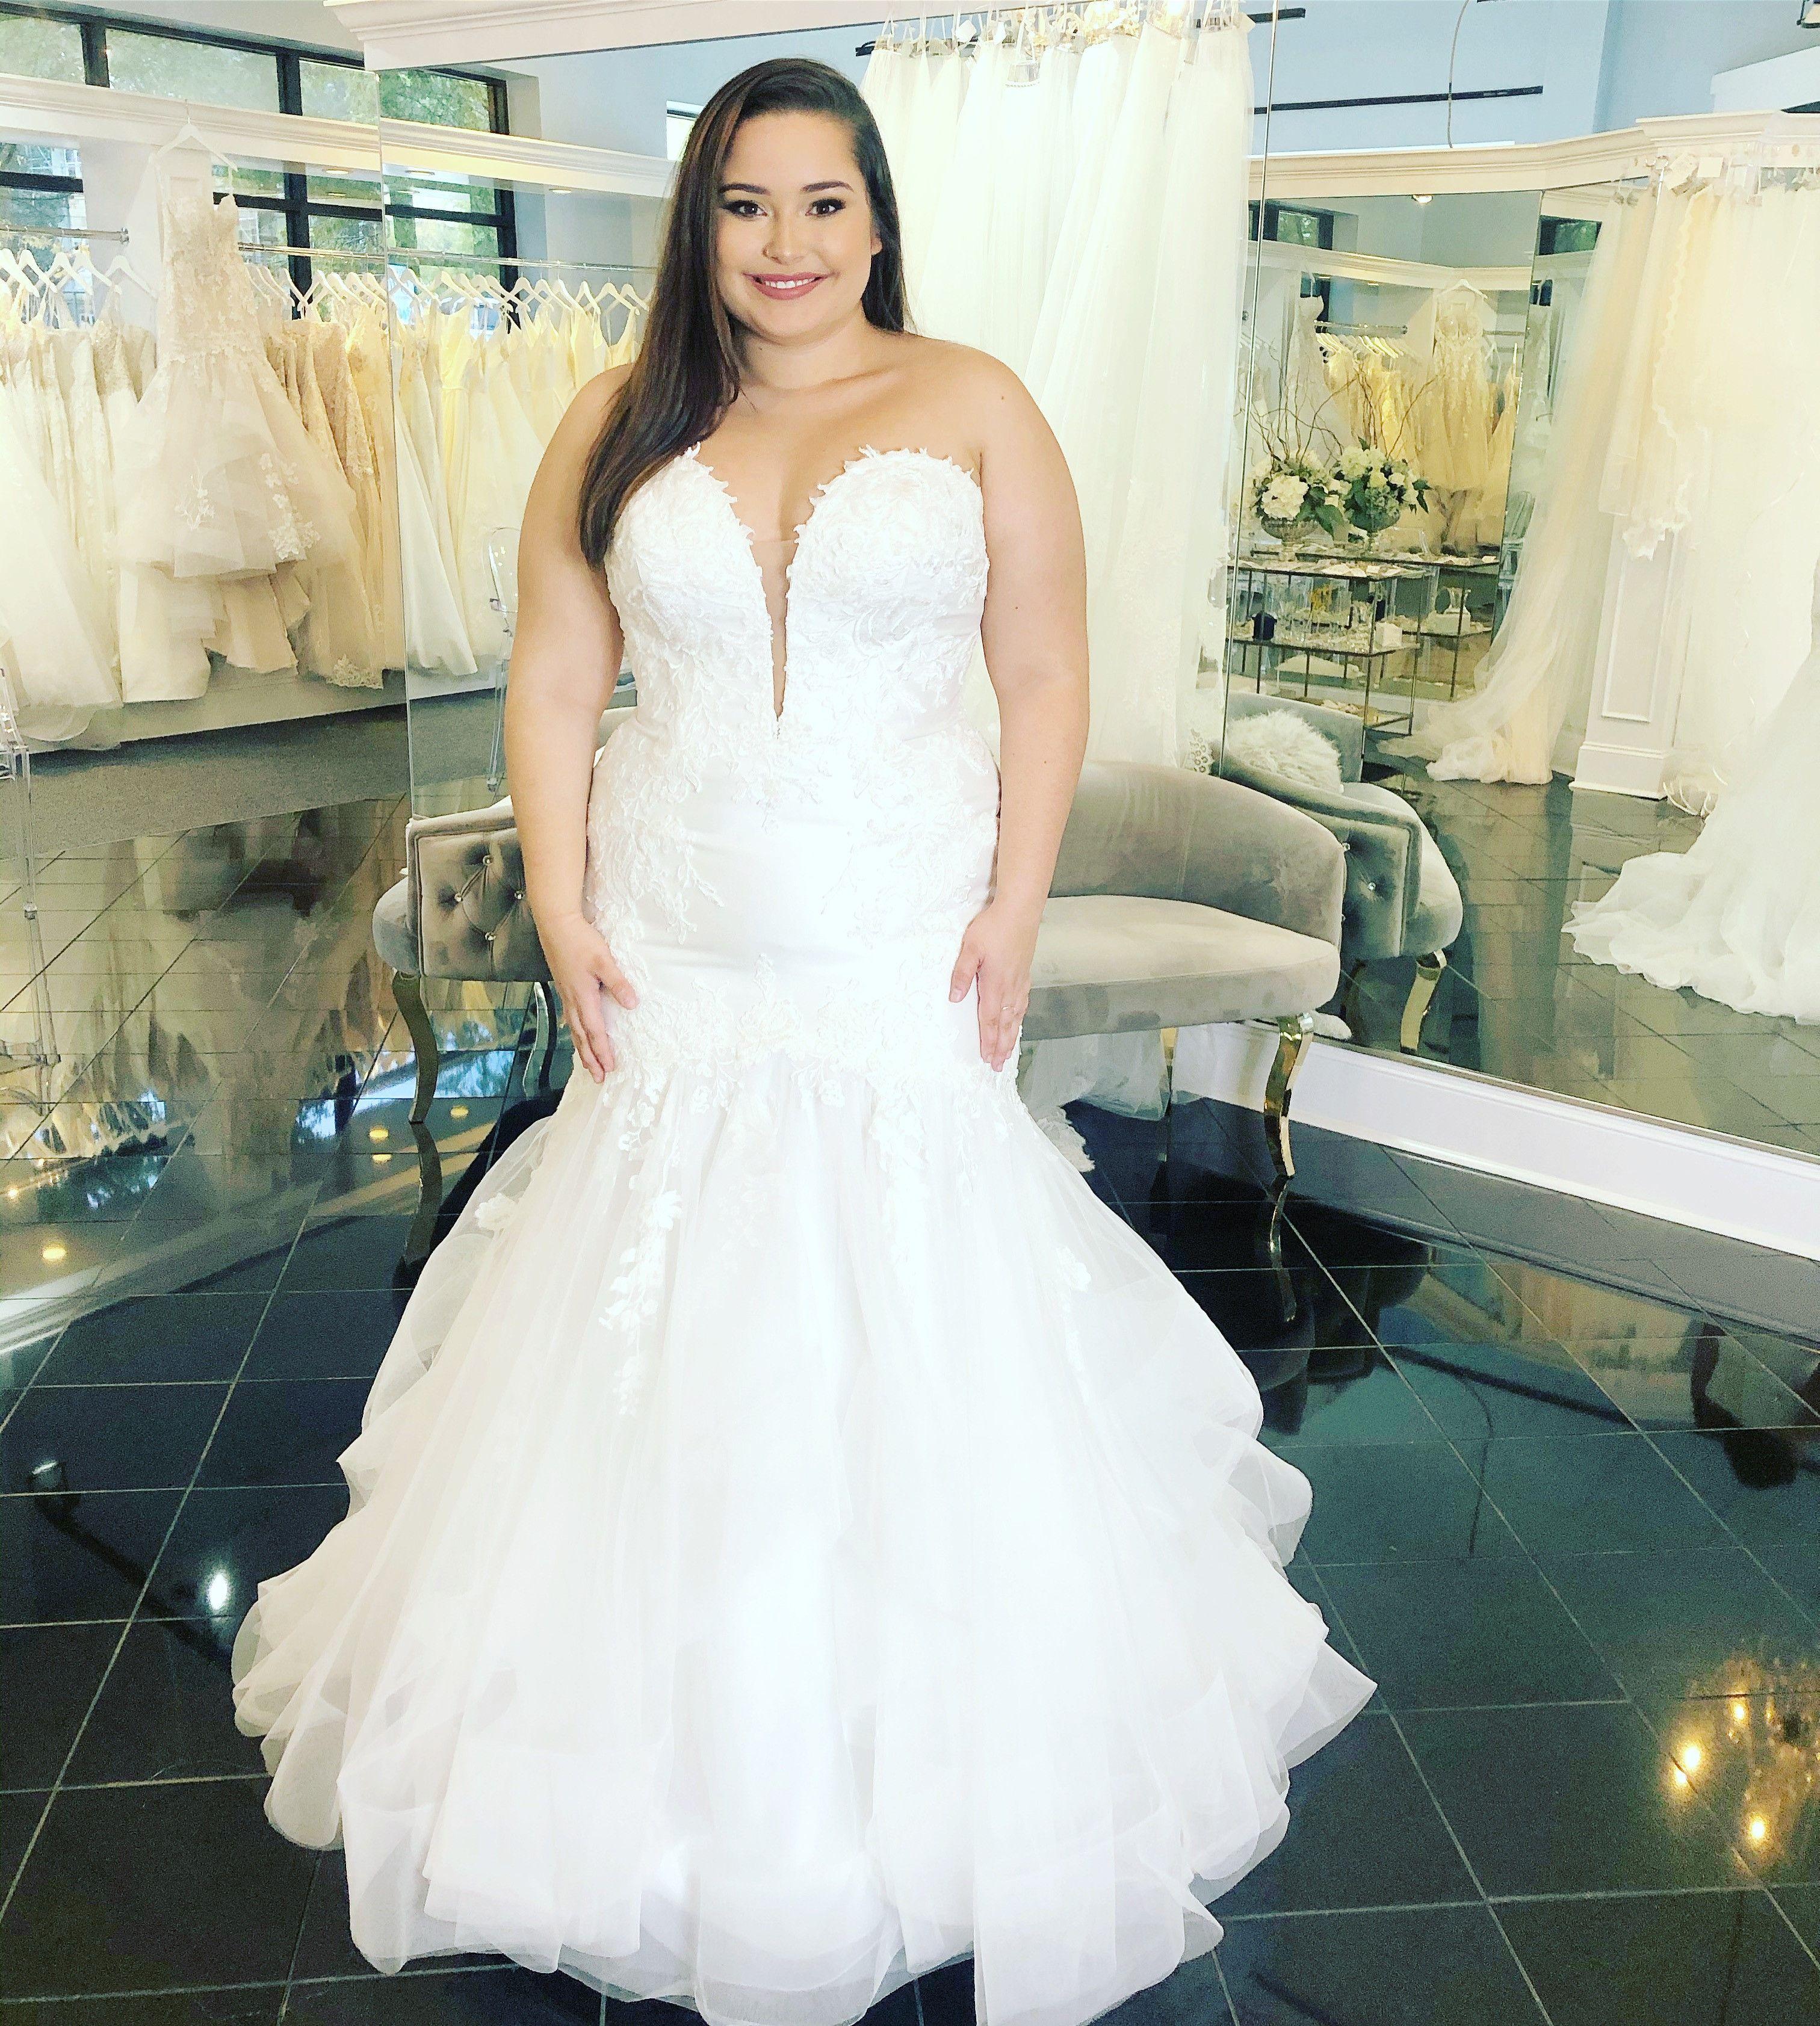 Unique Plus Size Mermaid Wedding Dress! in 2020 Wedding